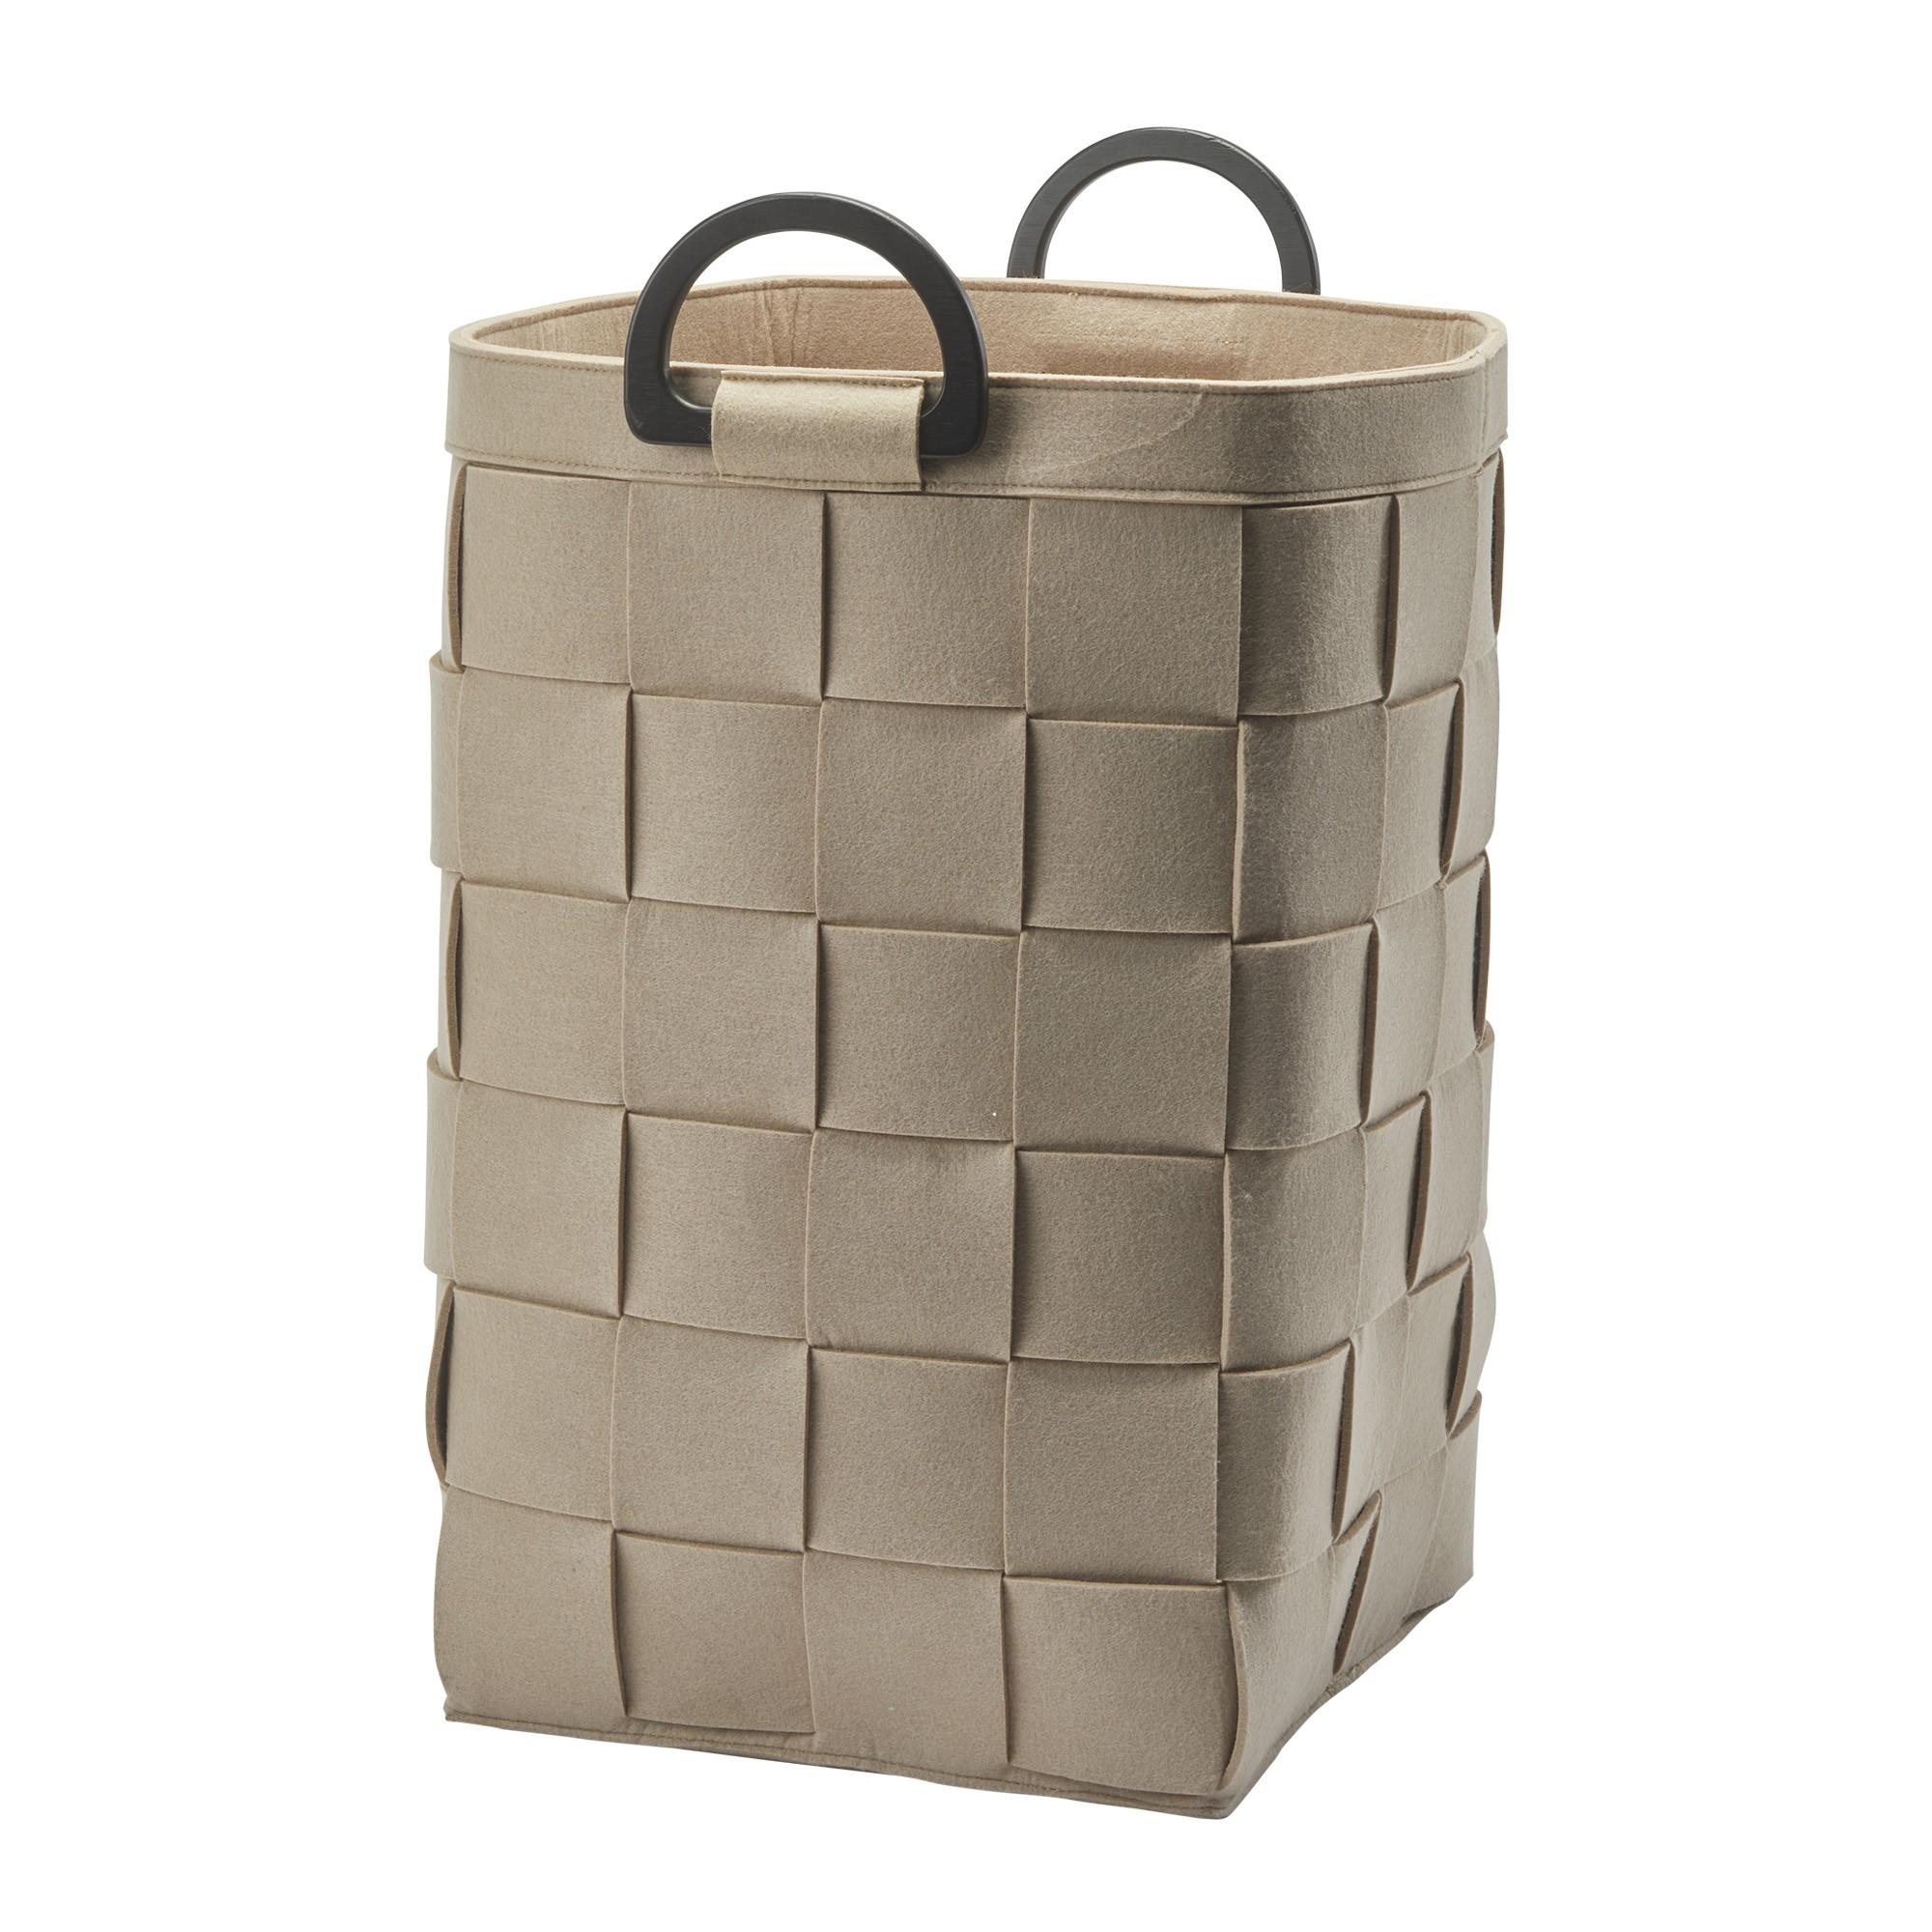 Aquanova Dix Felt Fabric Laundry Basket, 66 Litre, Beige